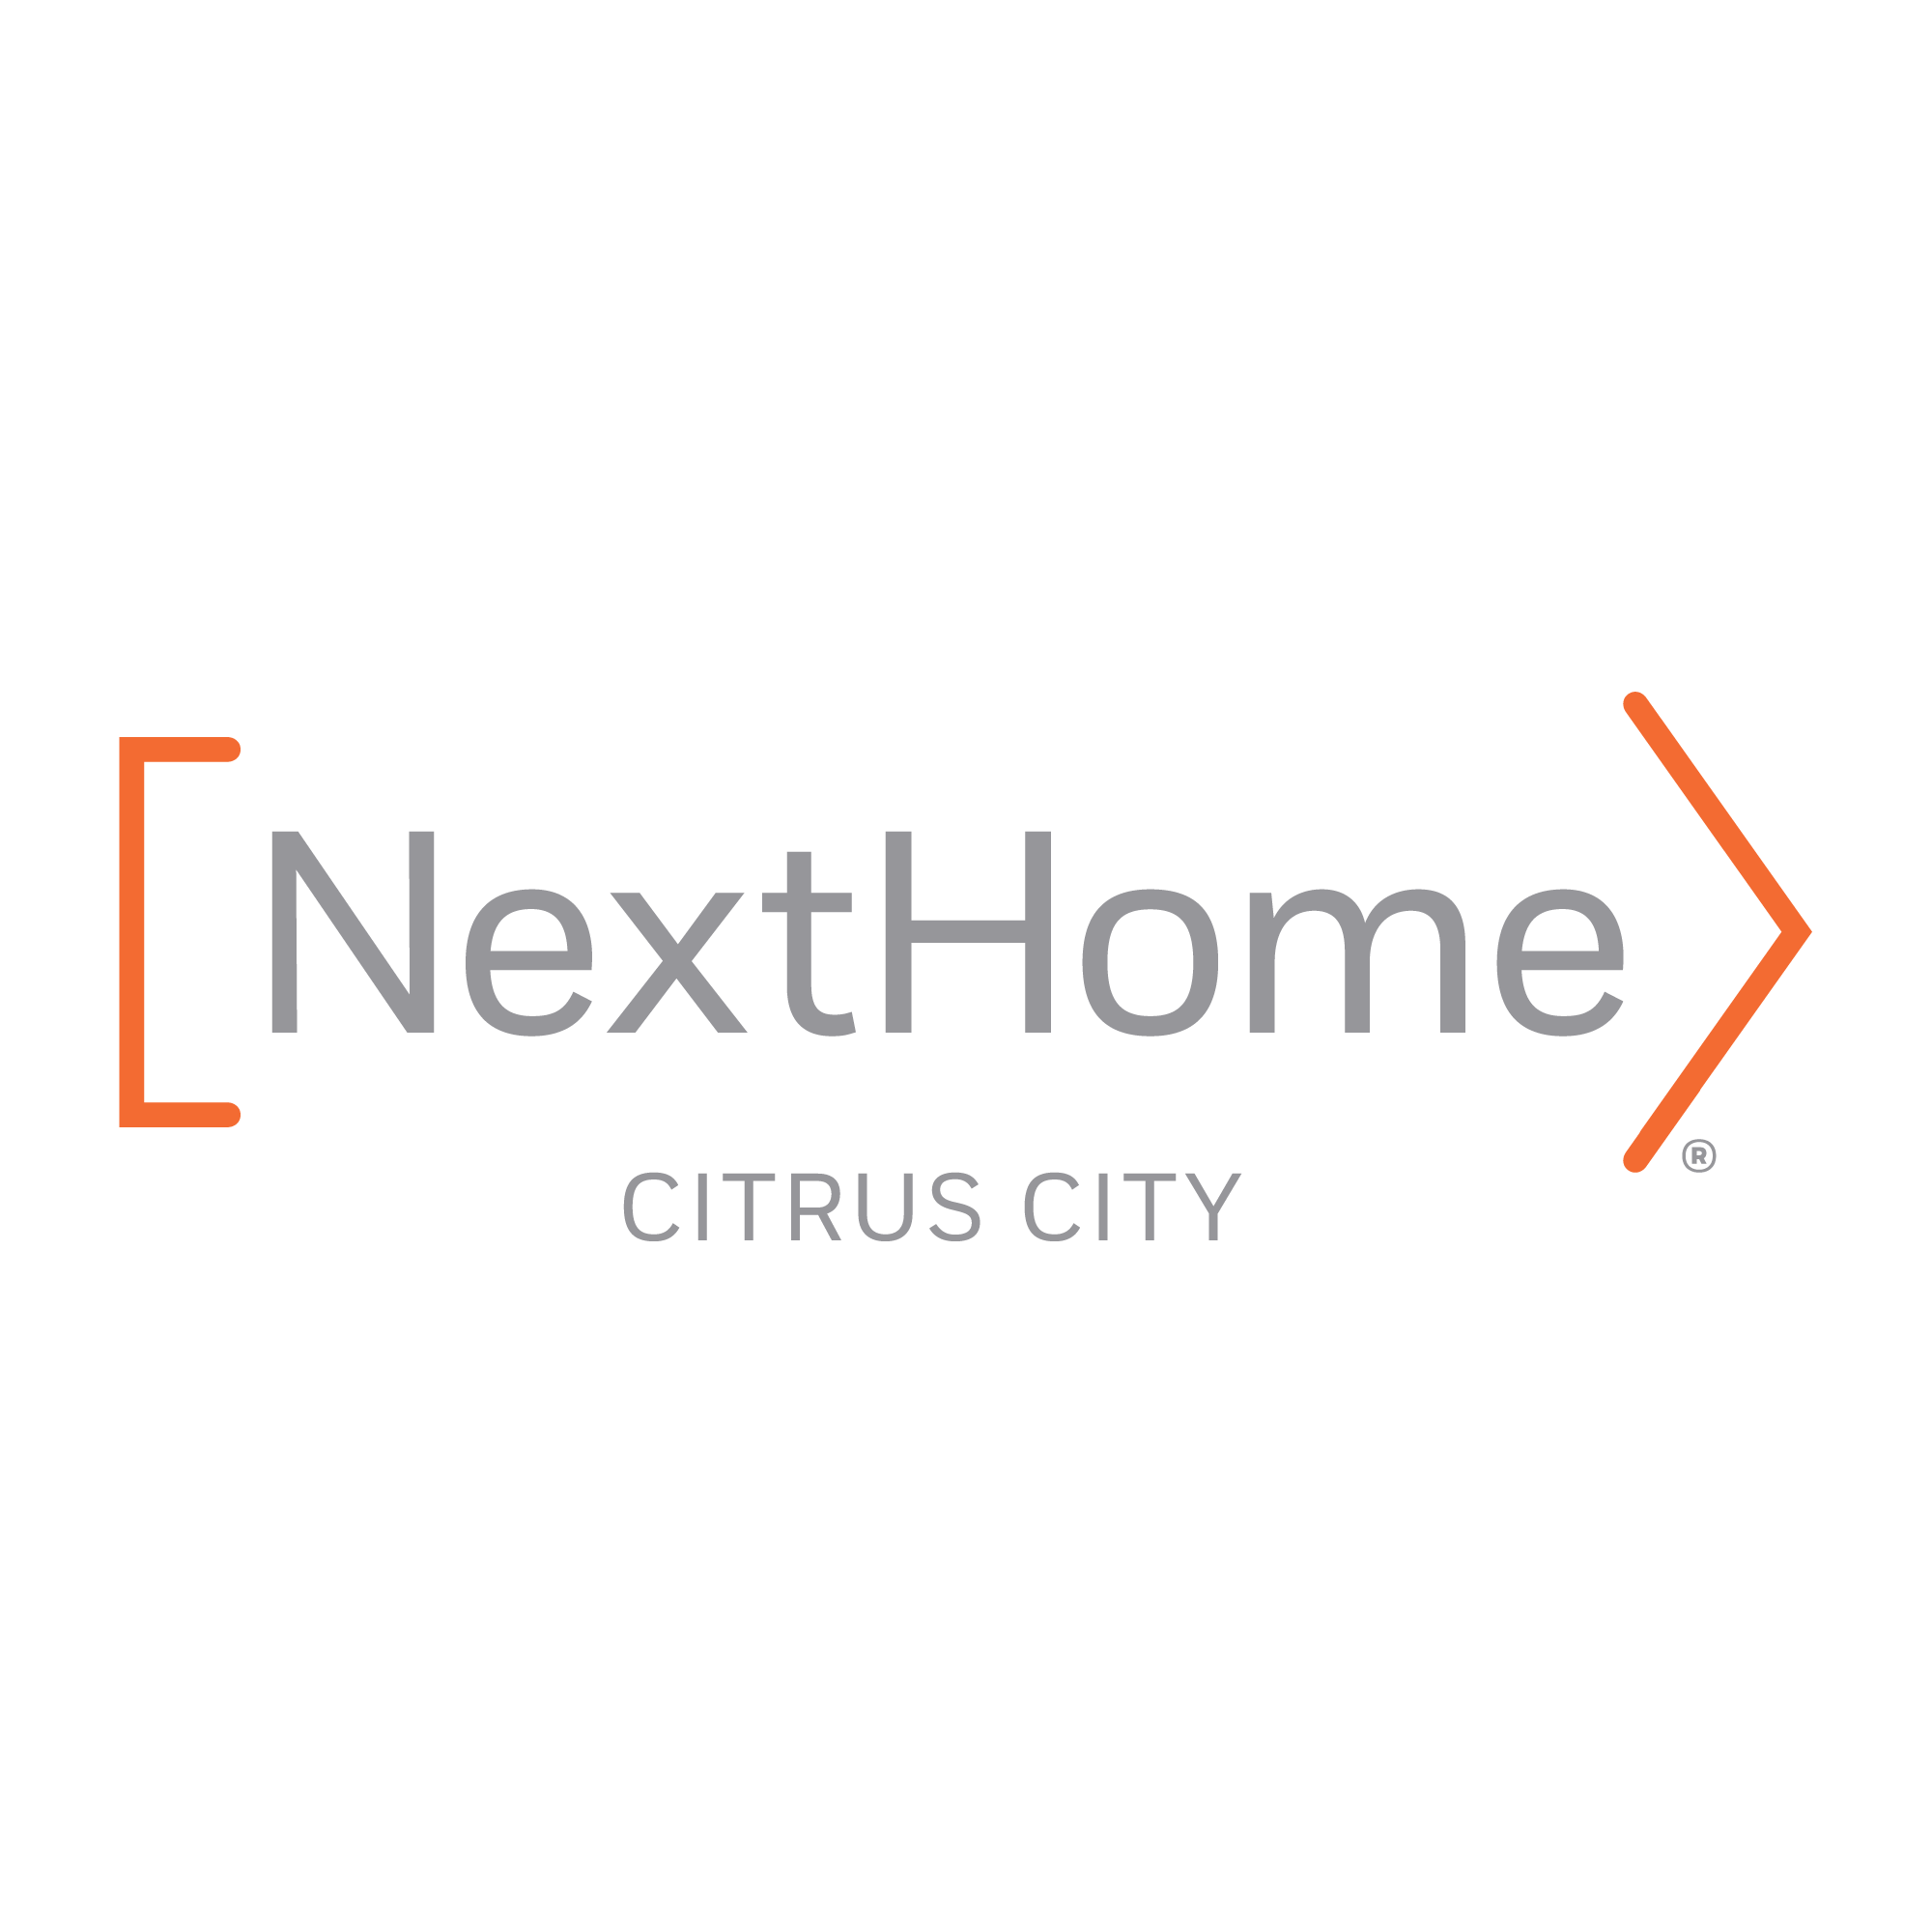 Scott Gieser of NextHome Citrus City